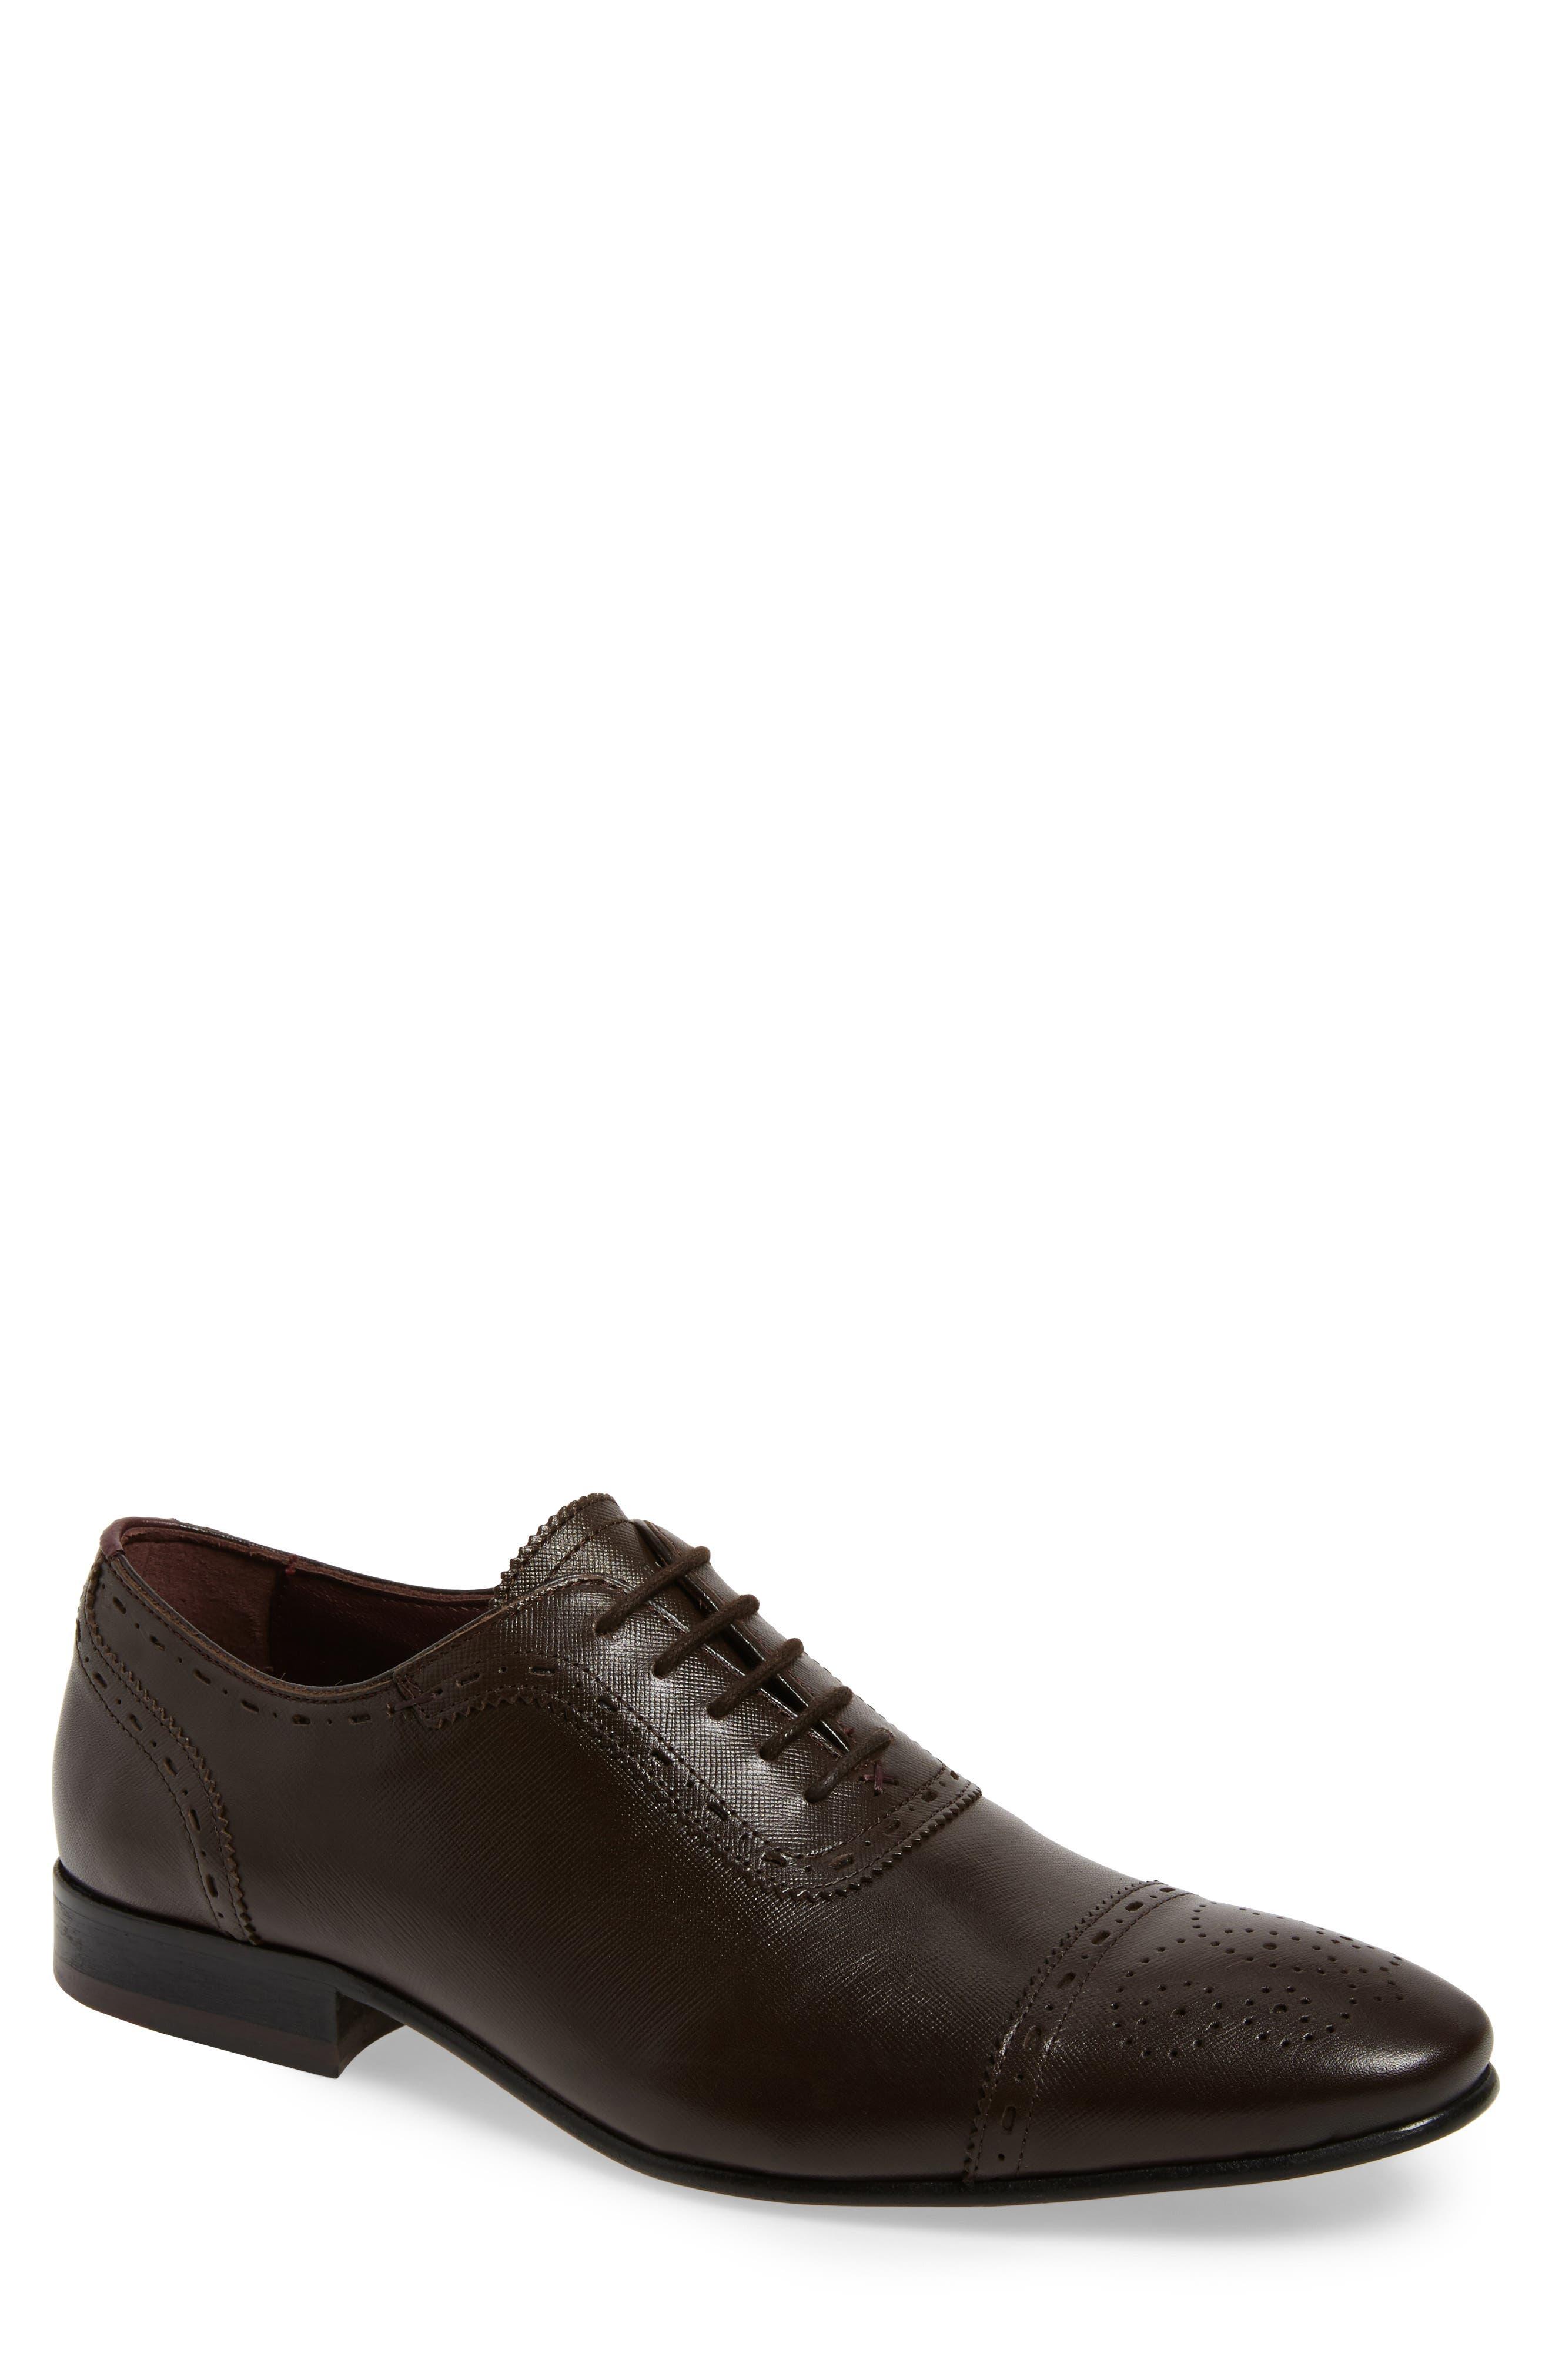 Barliy Cap Toe Oxford,                             Main thumbnail 1, color,                             Brown Leather